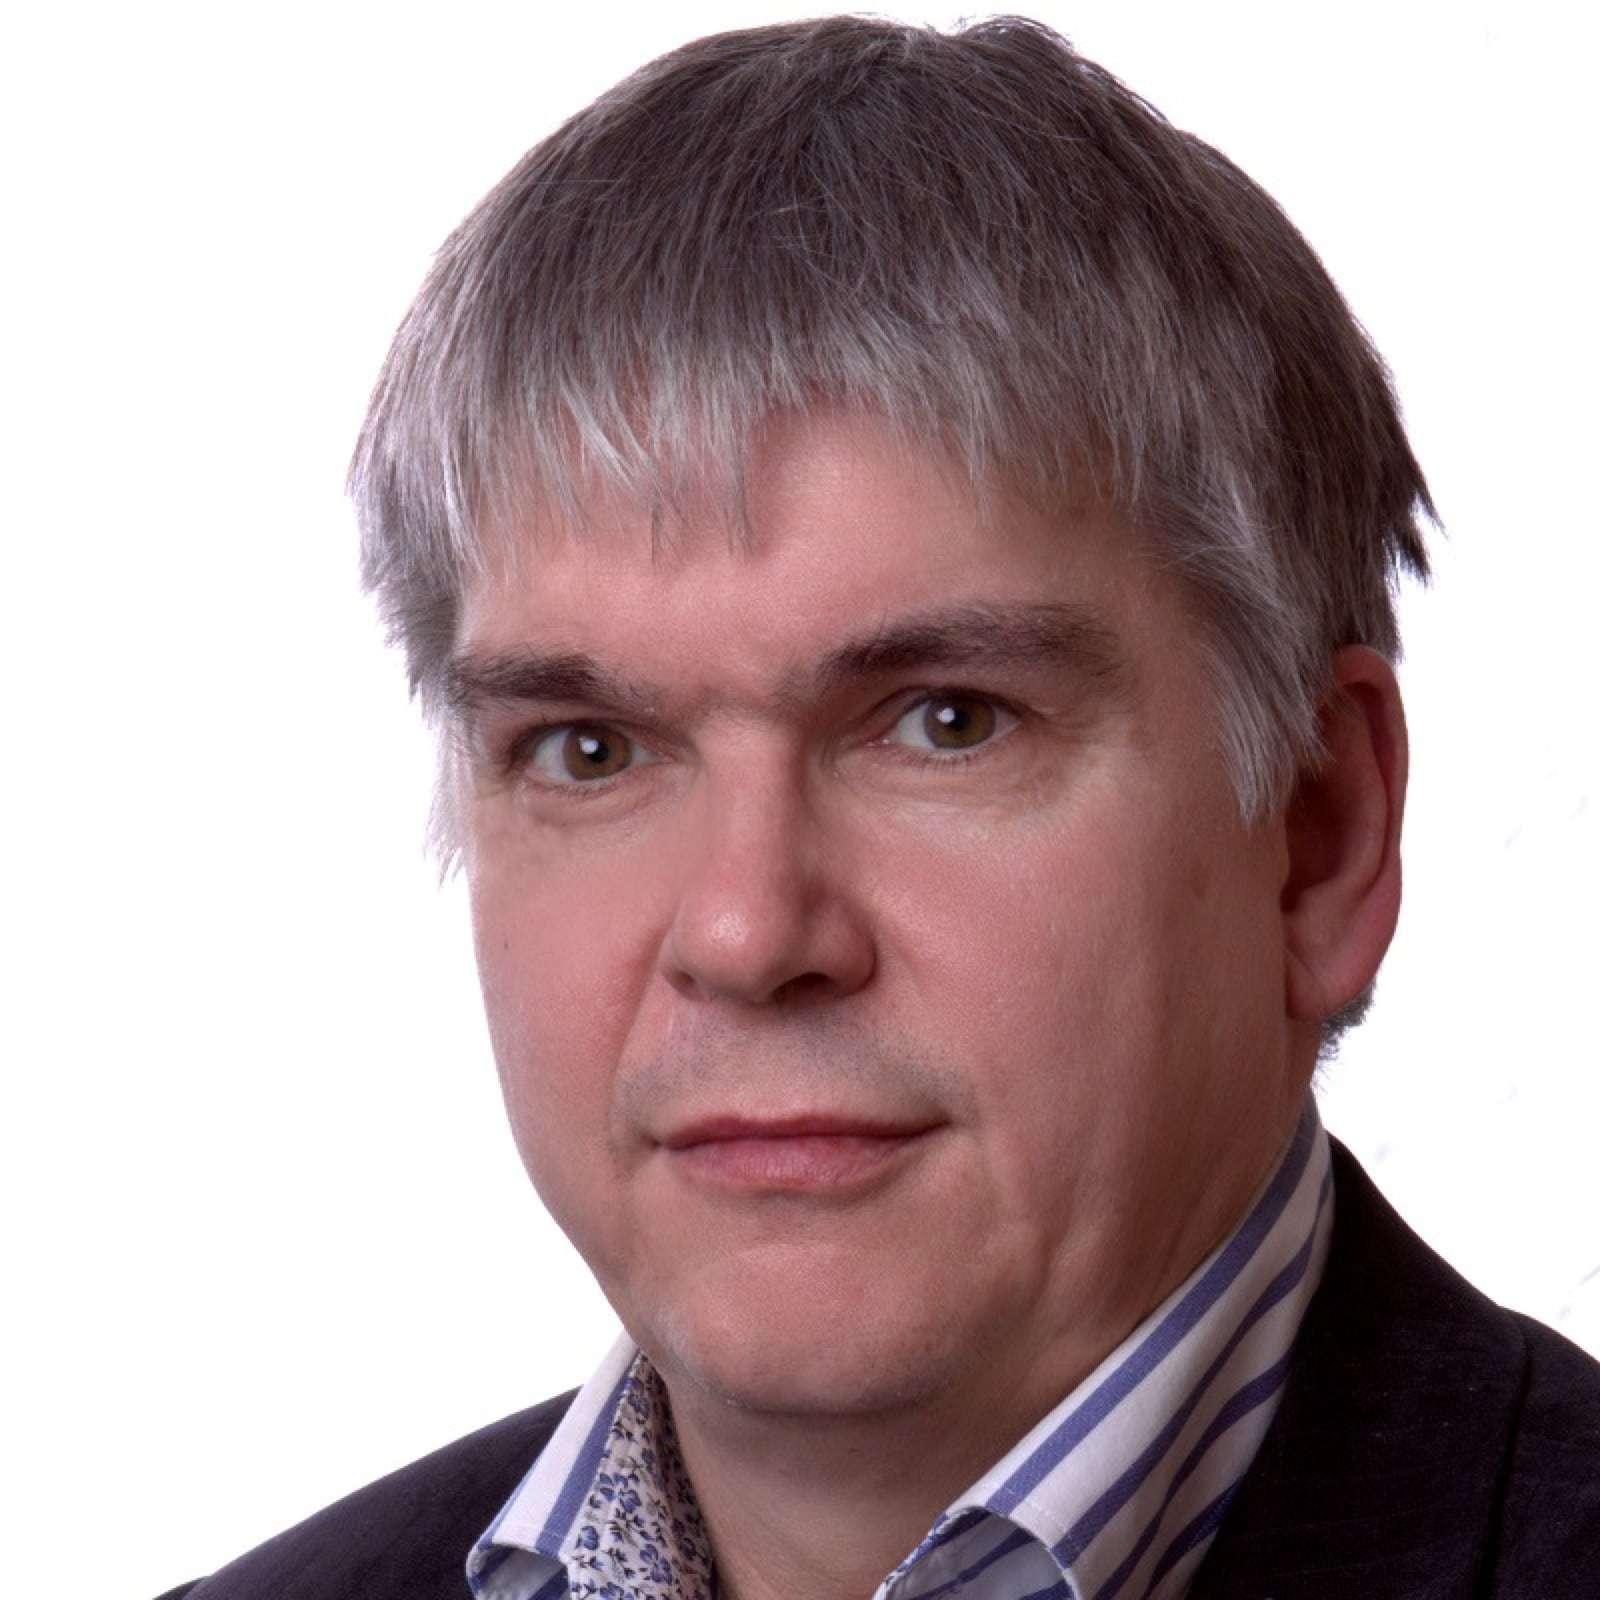 Erik Blom - Vestigingsmanager in Raalte